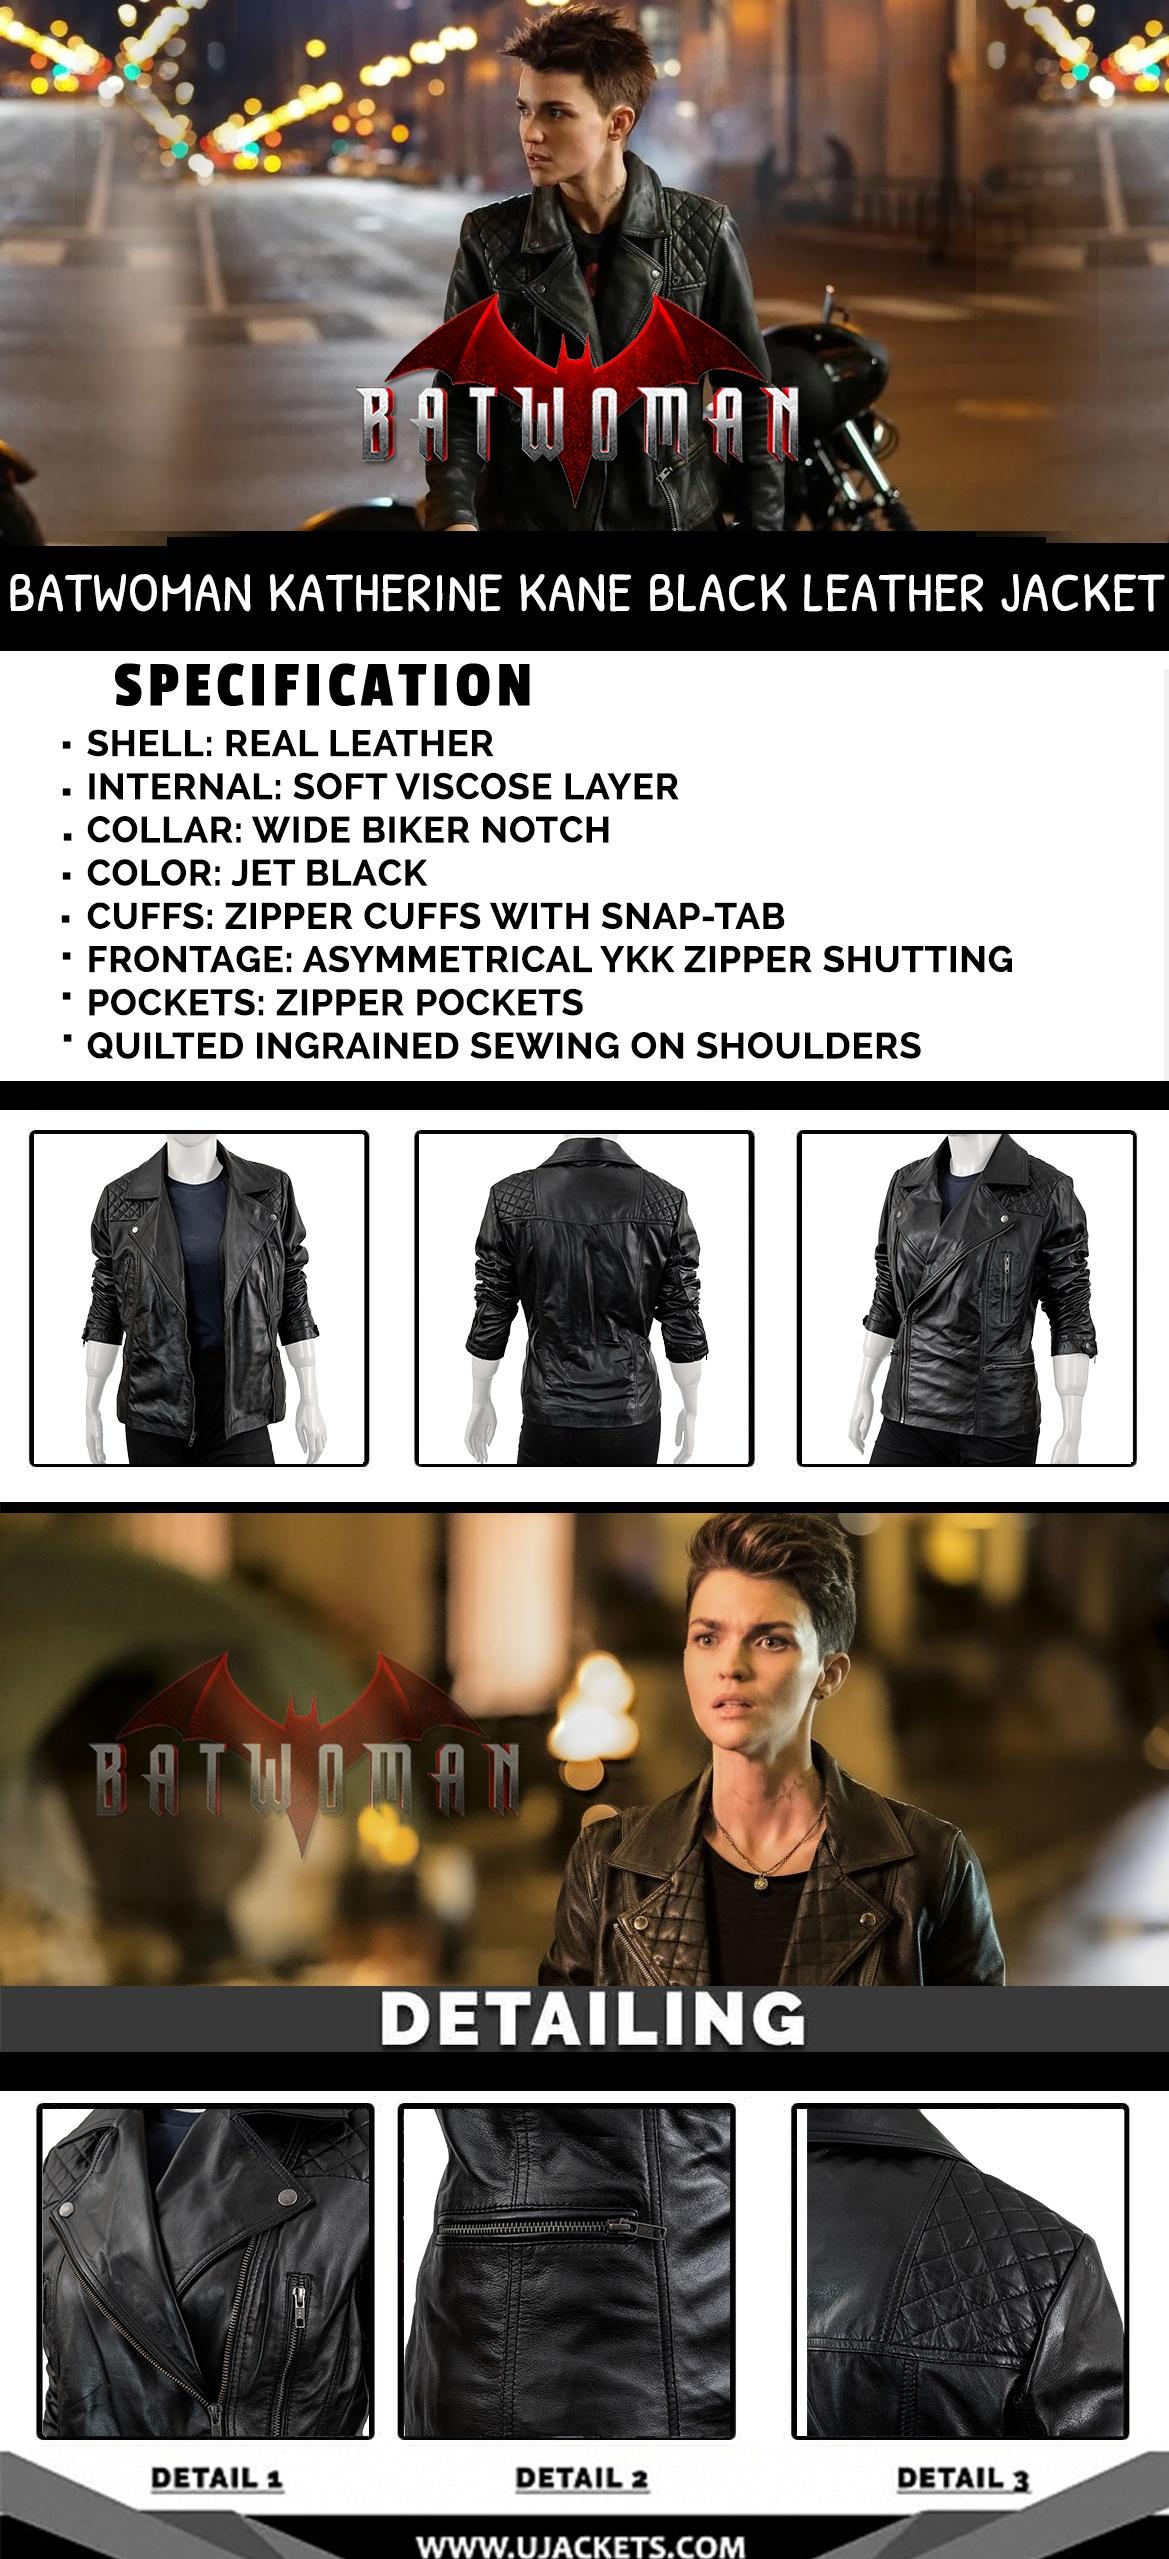 Btawoman Black leather Jacket